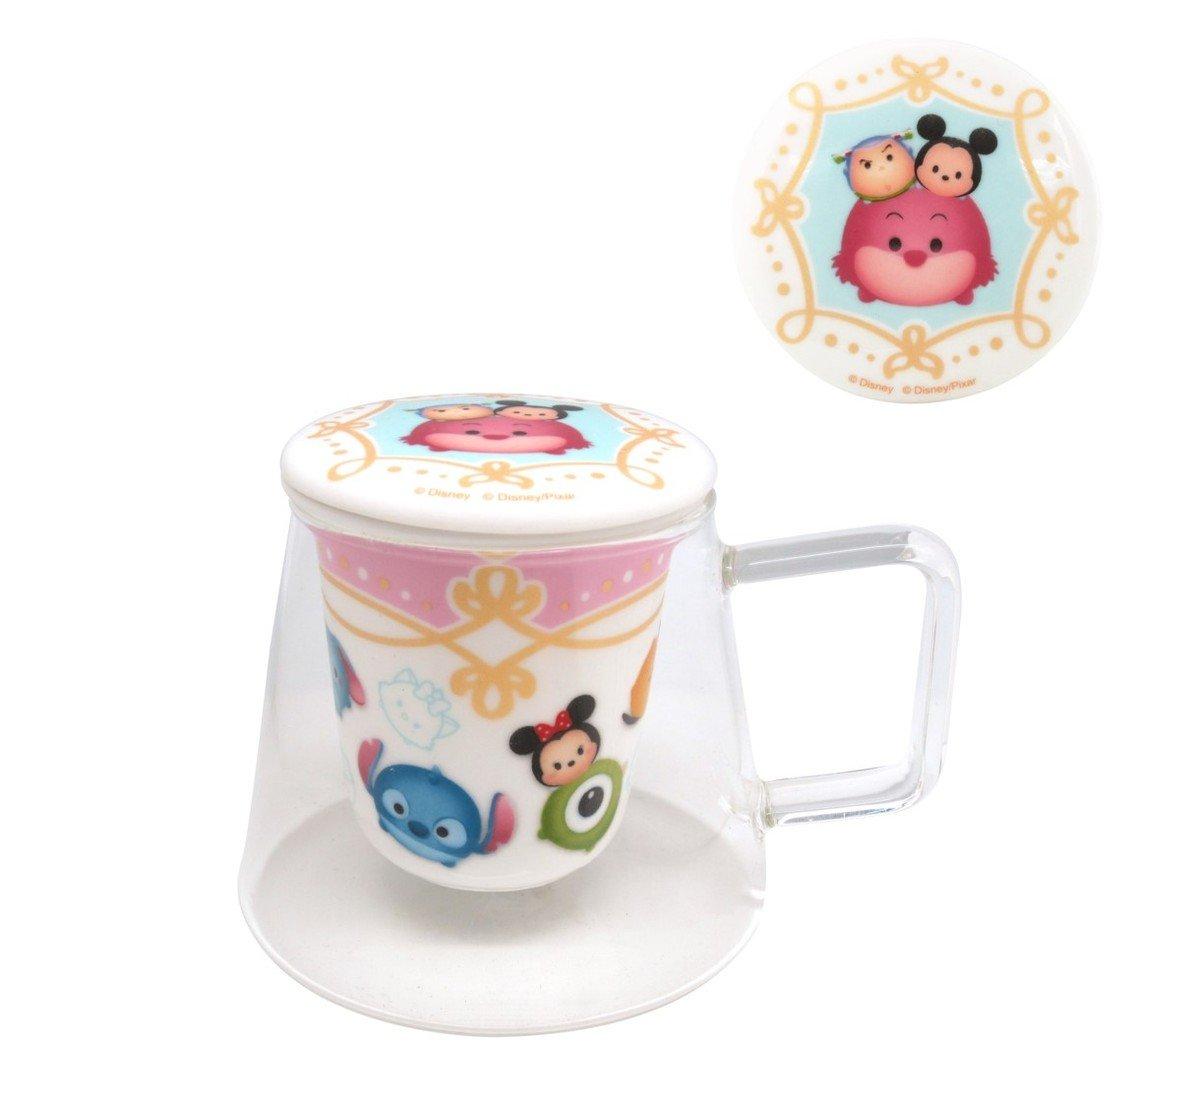 Spek Harga Disney Frozen Lunch Box Elsa Pink Dan Kelebihan Source · DISNEY Glass mug with